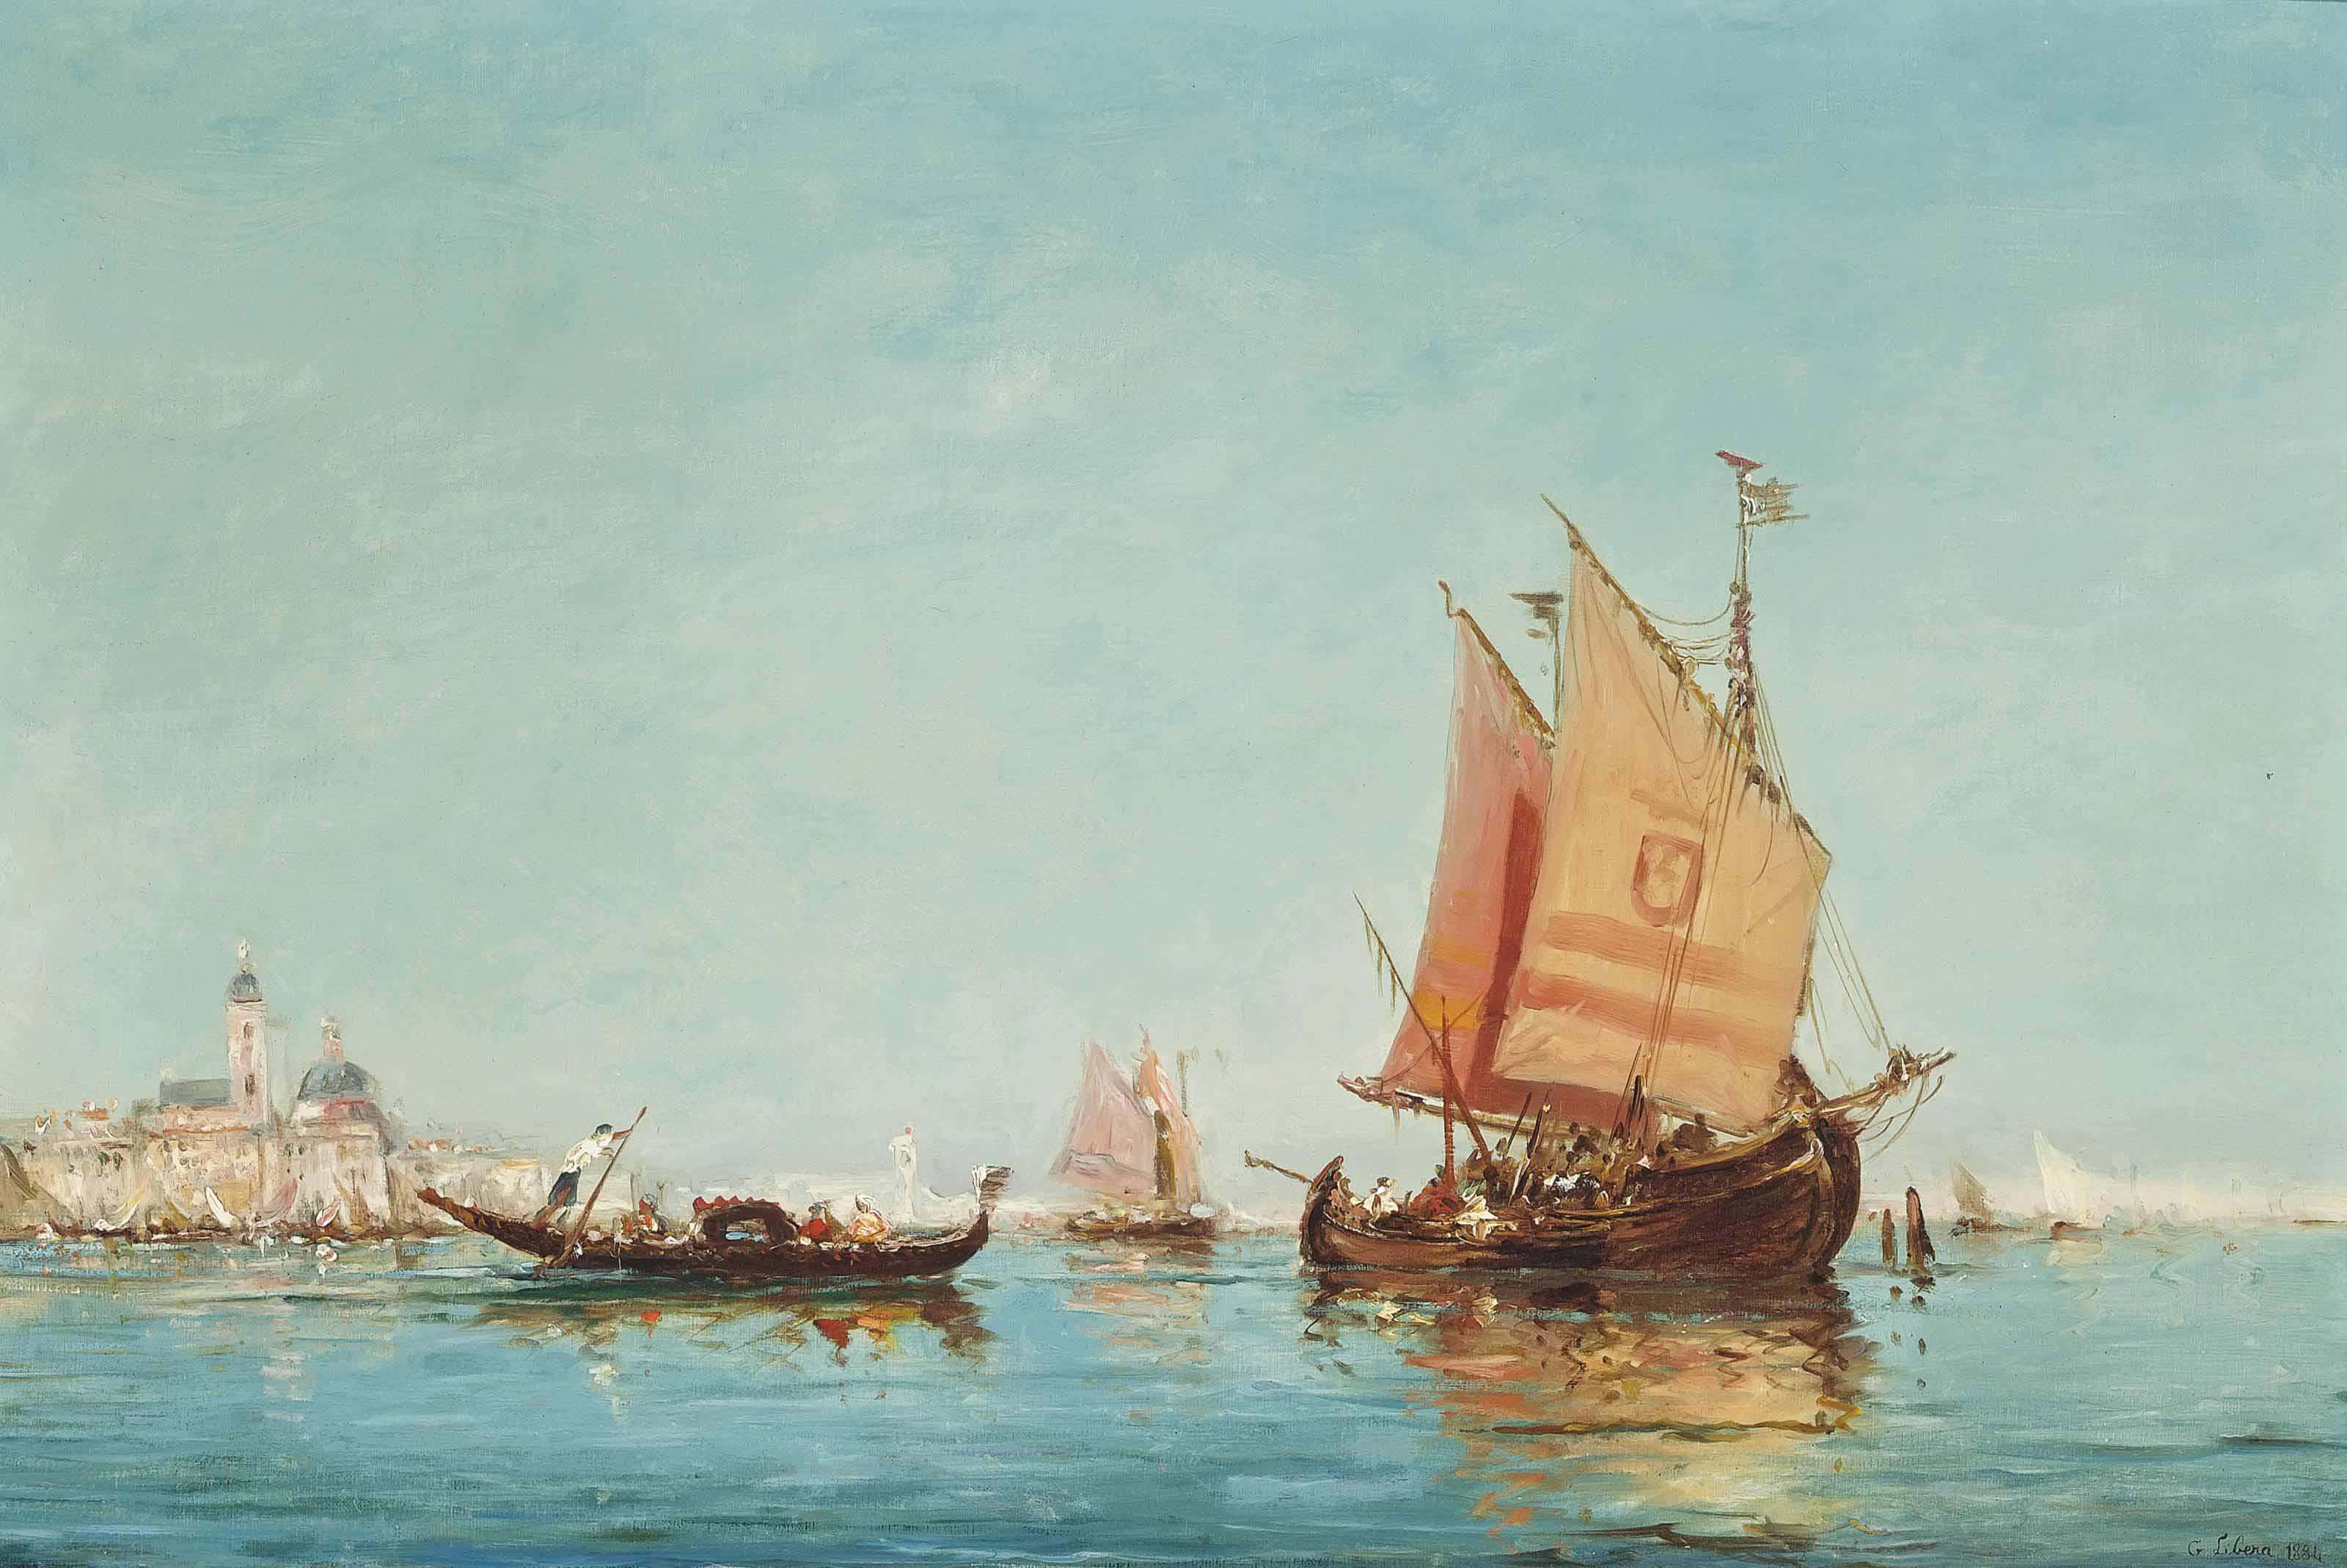 Vessels on the Venetian lagoon, Santa Maria della Salute and St Mark's Campanile beyond